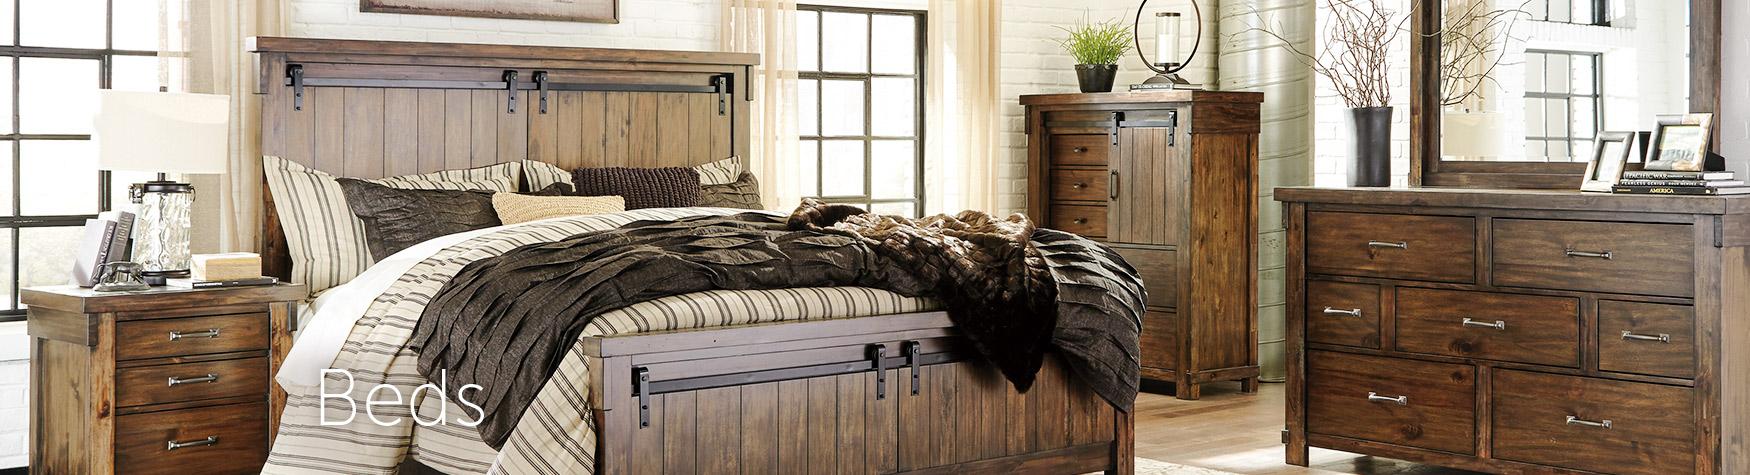 beds-banner.jpg